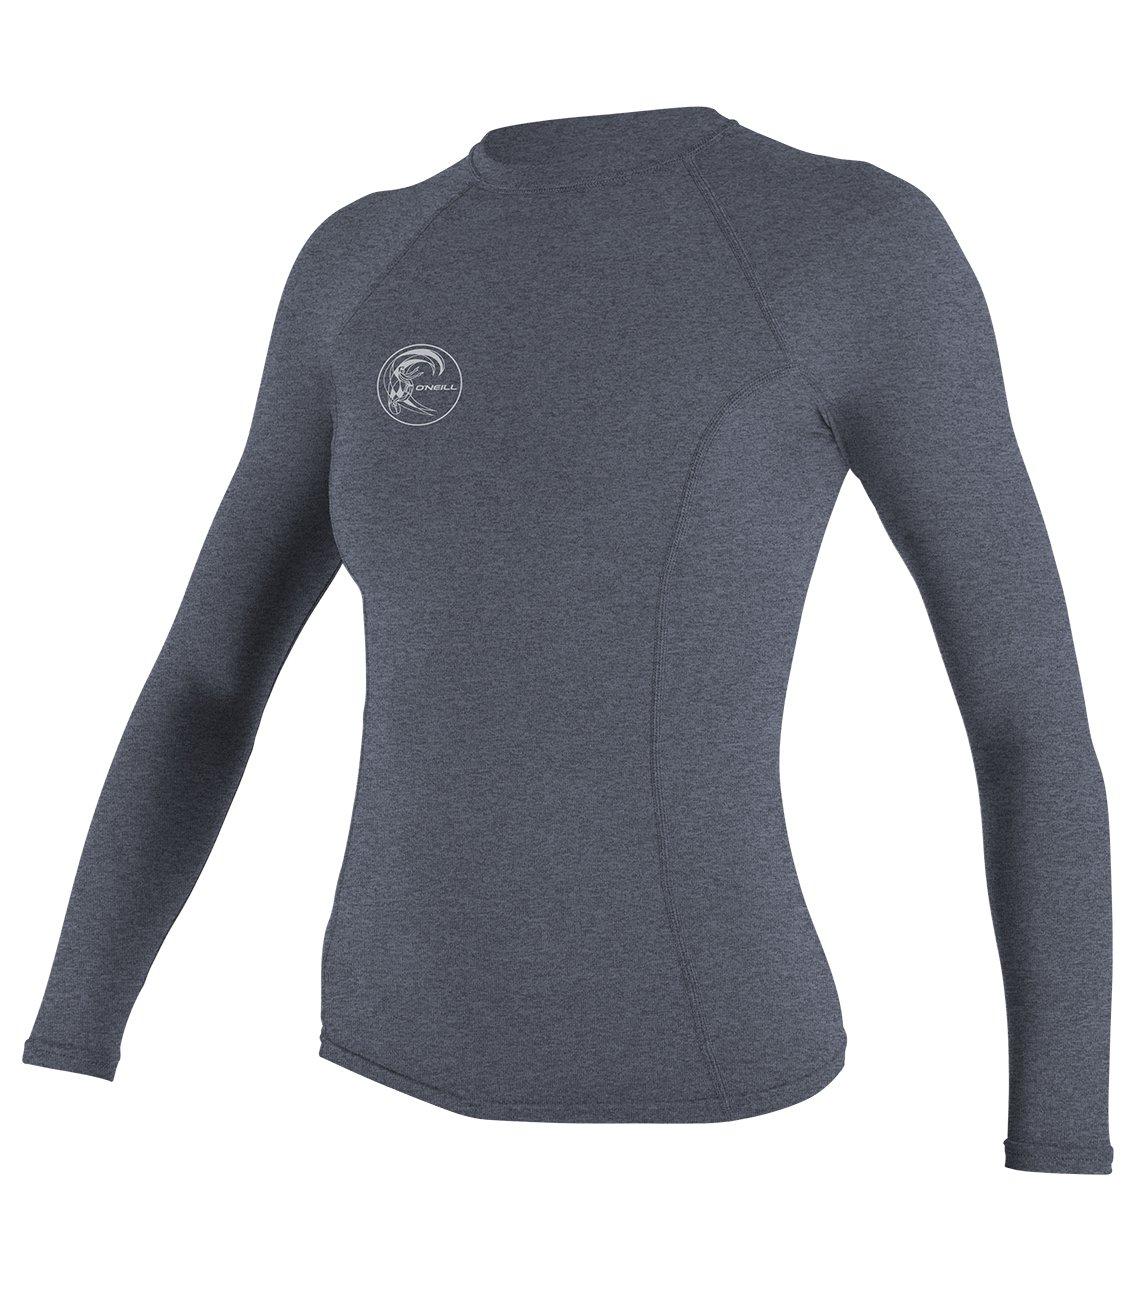 O'Neill Wetsuits Women's Hybrid UPF 50+ Long Sleeve Rash Guard, Mist, Small by O'Neill Wetsuits